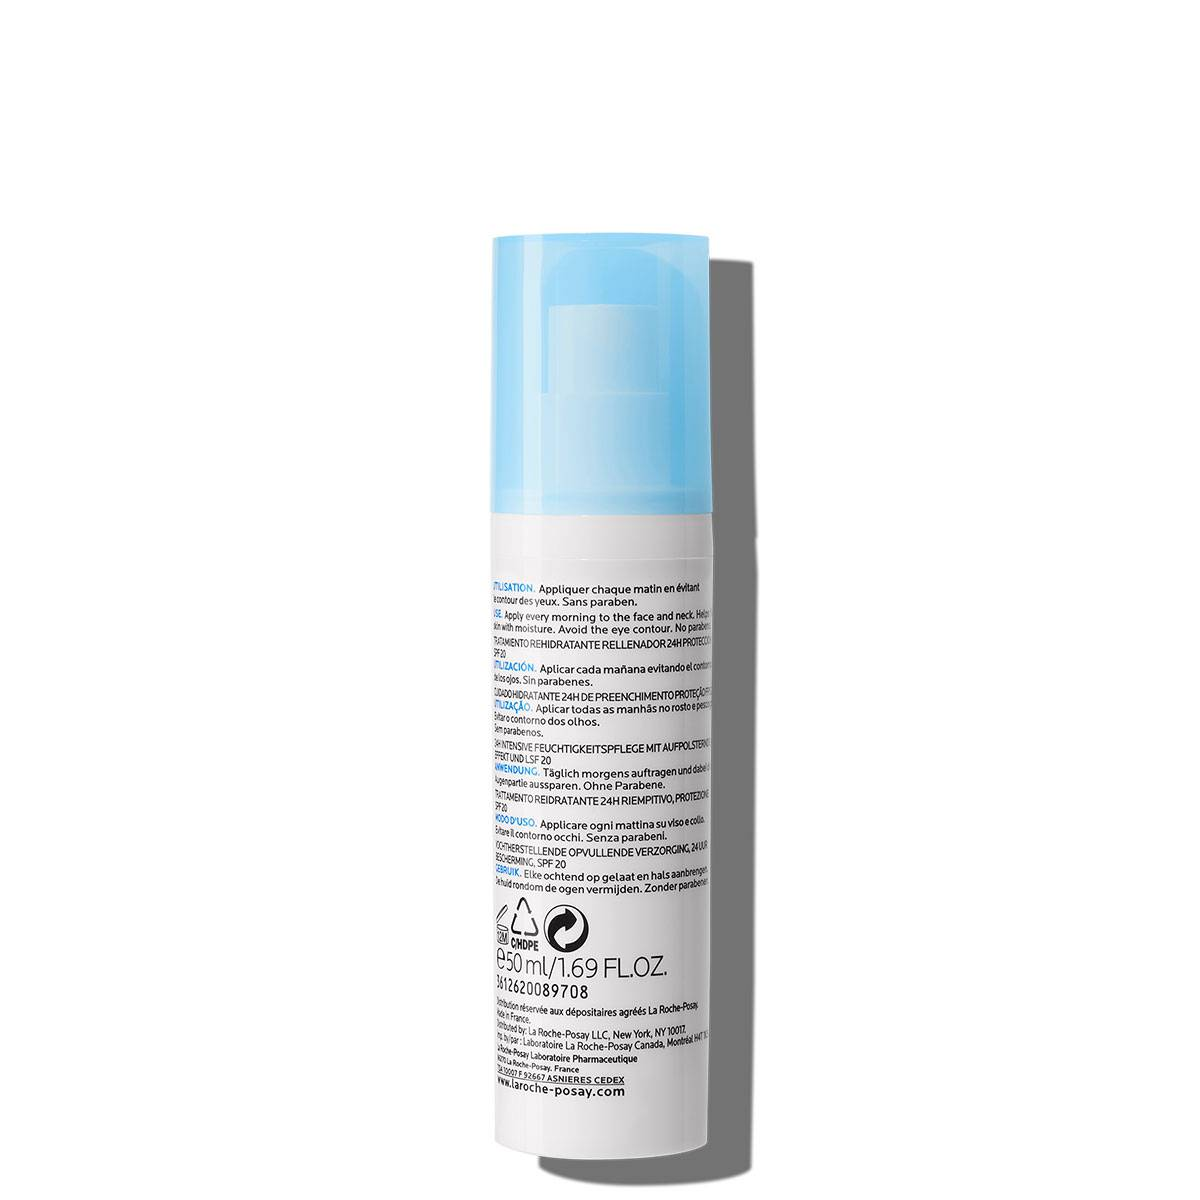 La Roche Posay ProduktSide Hydraphase UV Intense Rich Spf20 50ml 33378